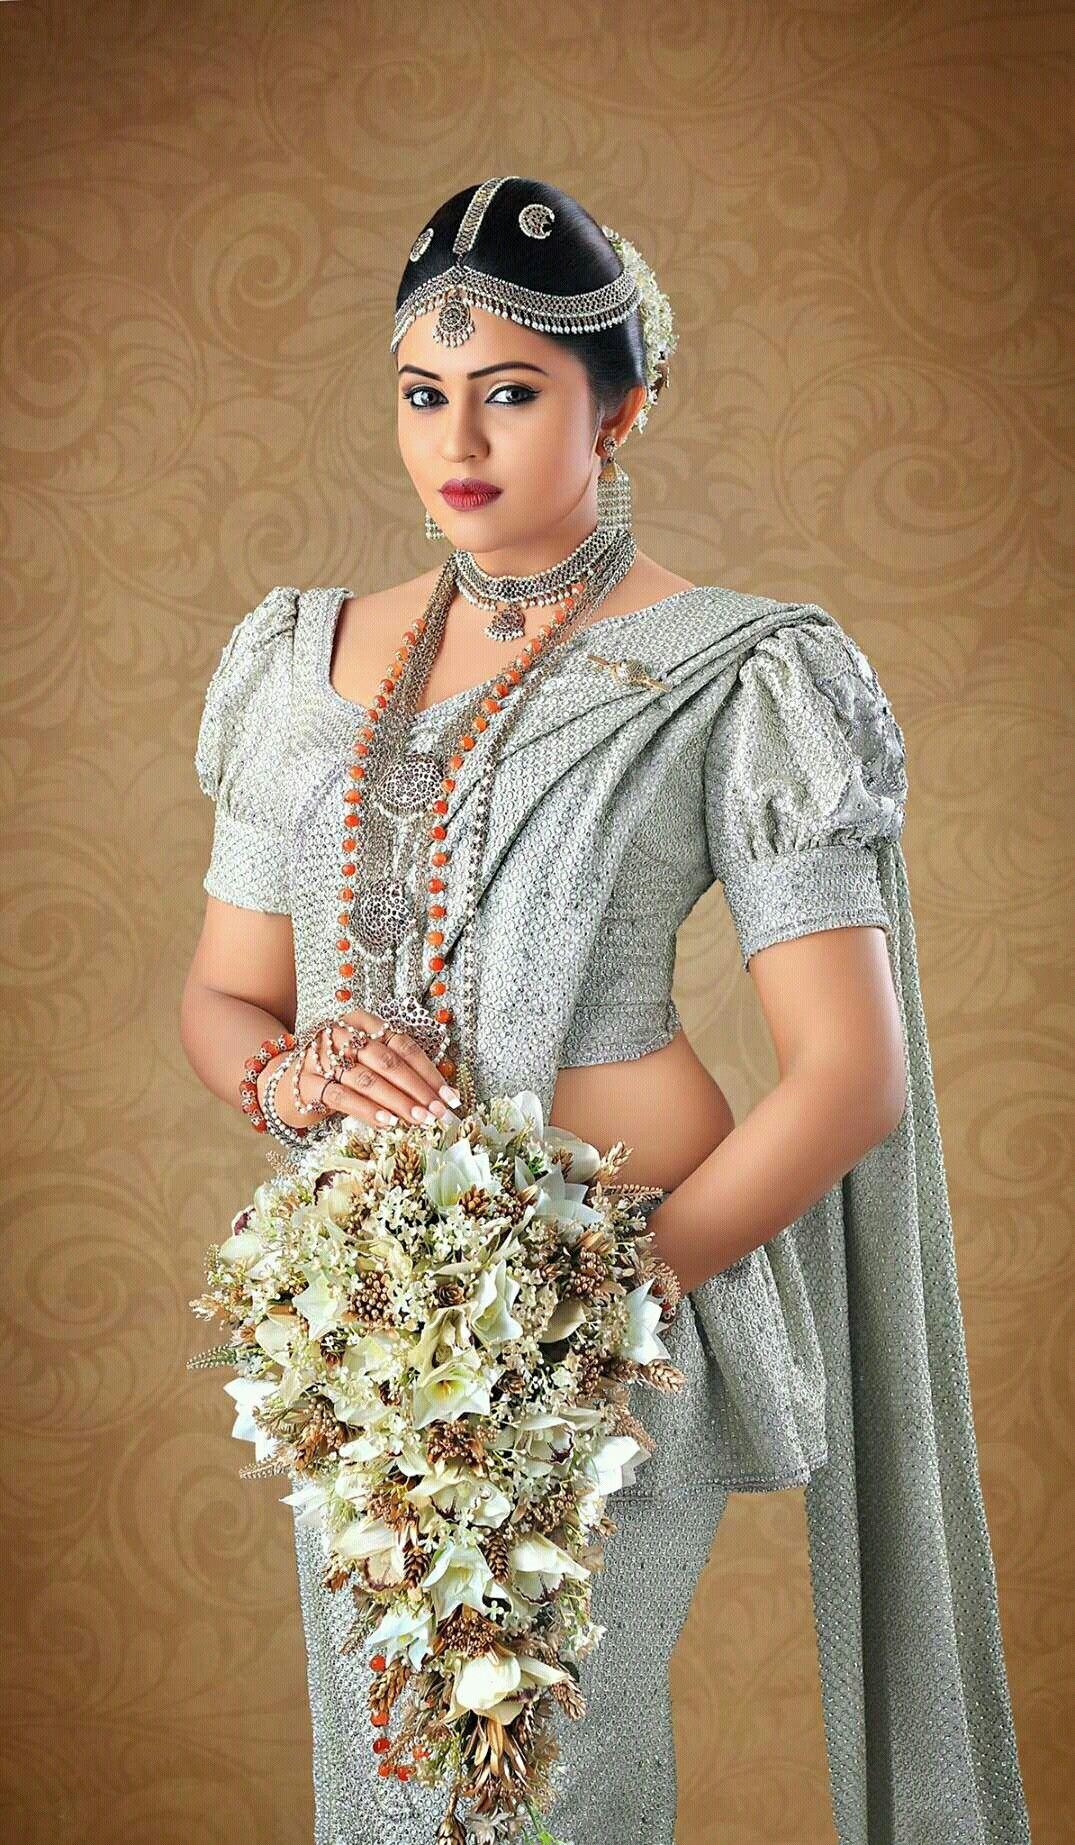 Pin de Yashodara Rathnathilaka en Kandian Brides   Pinterest